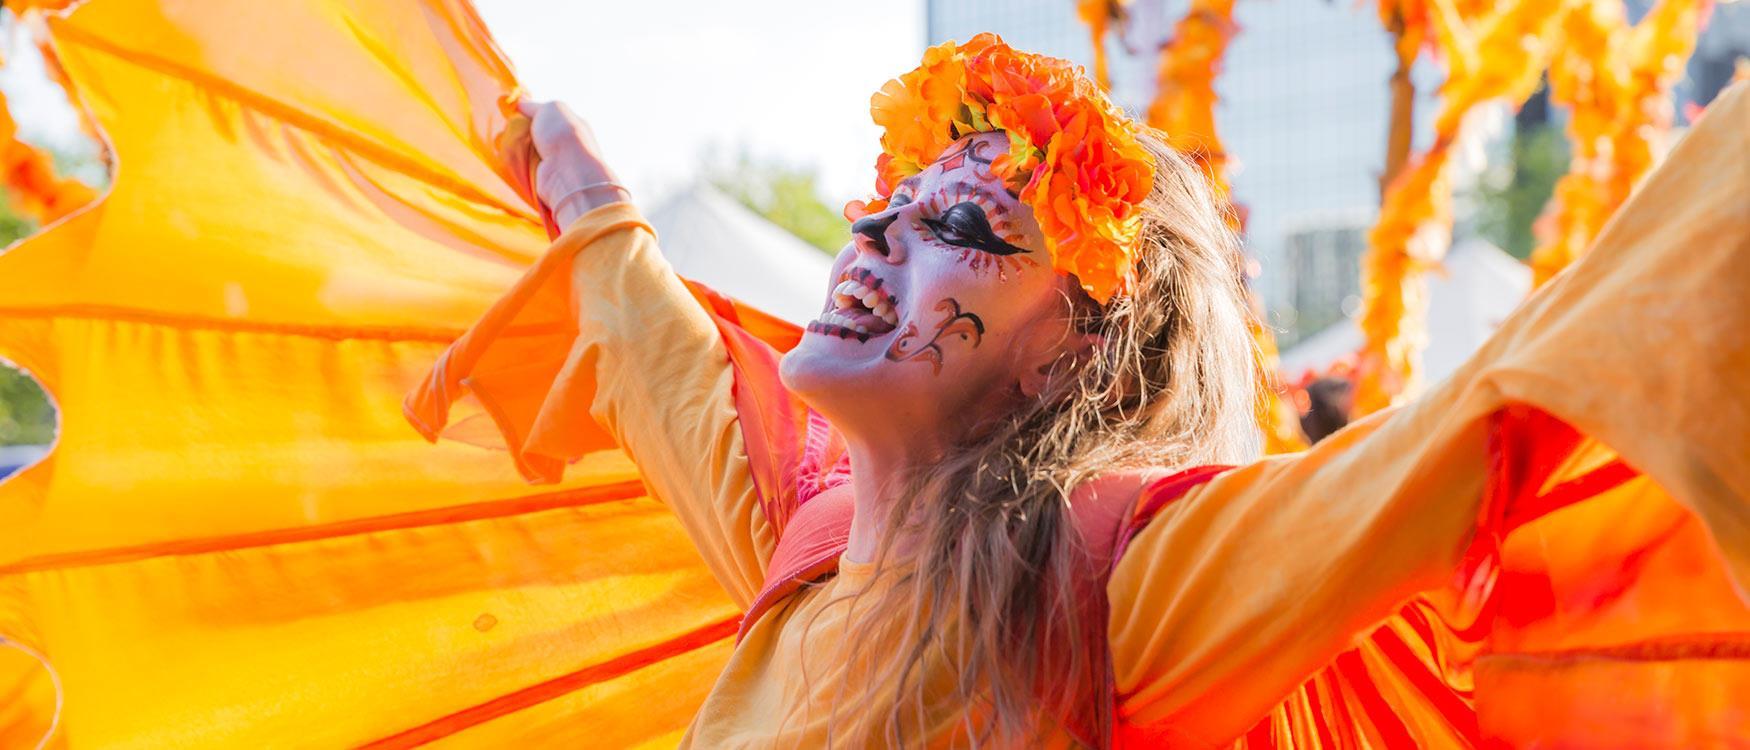 Events, festivals & performances